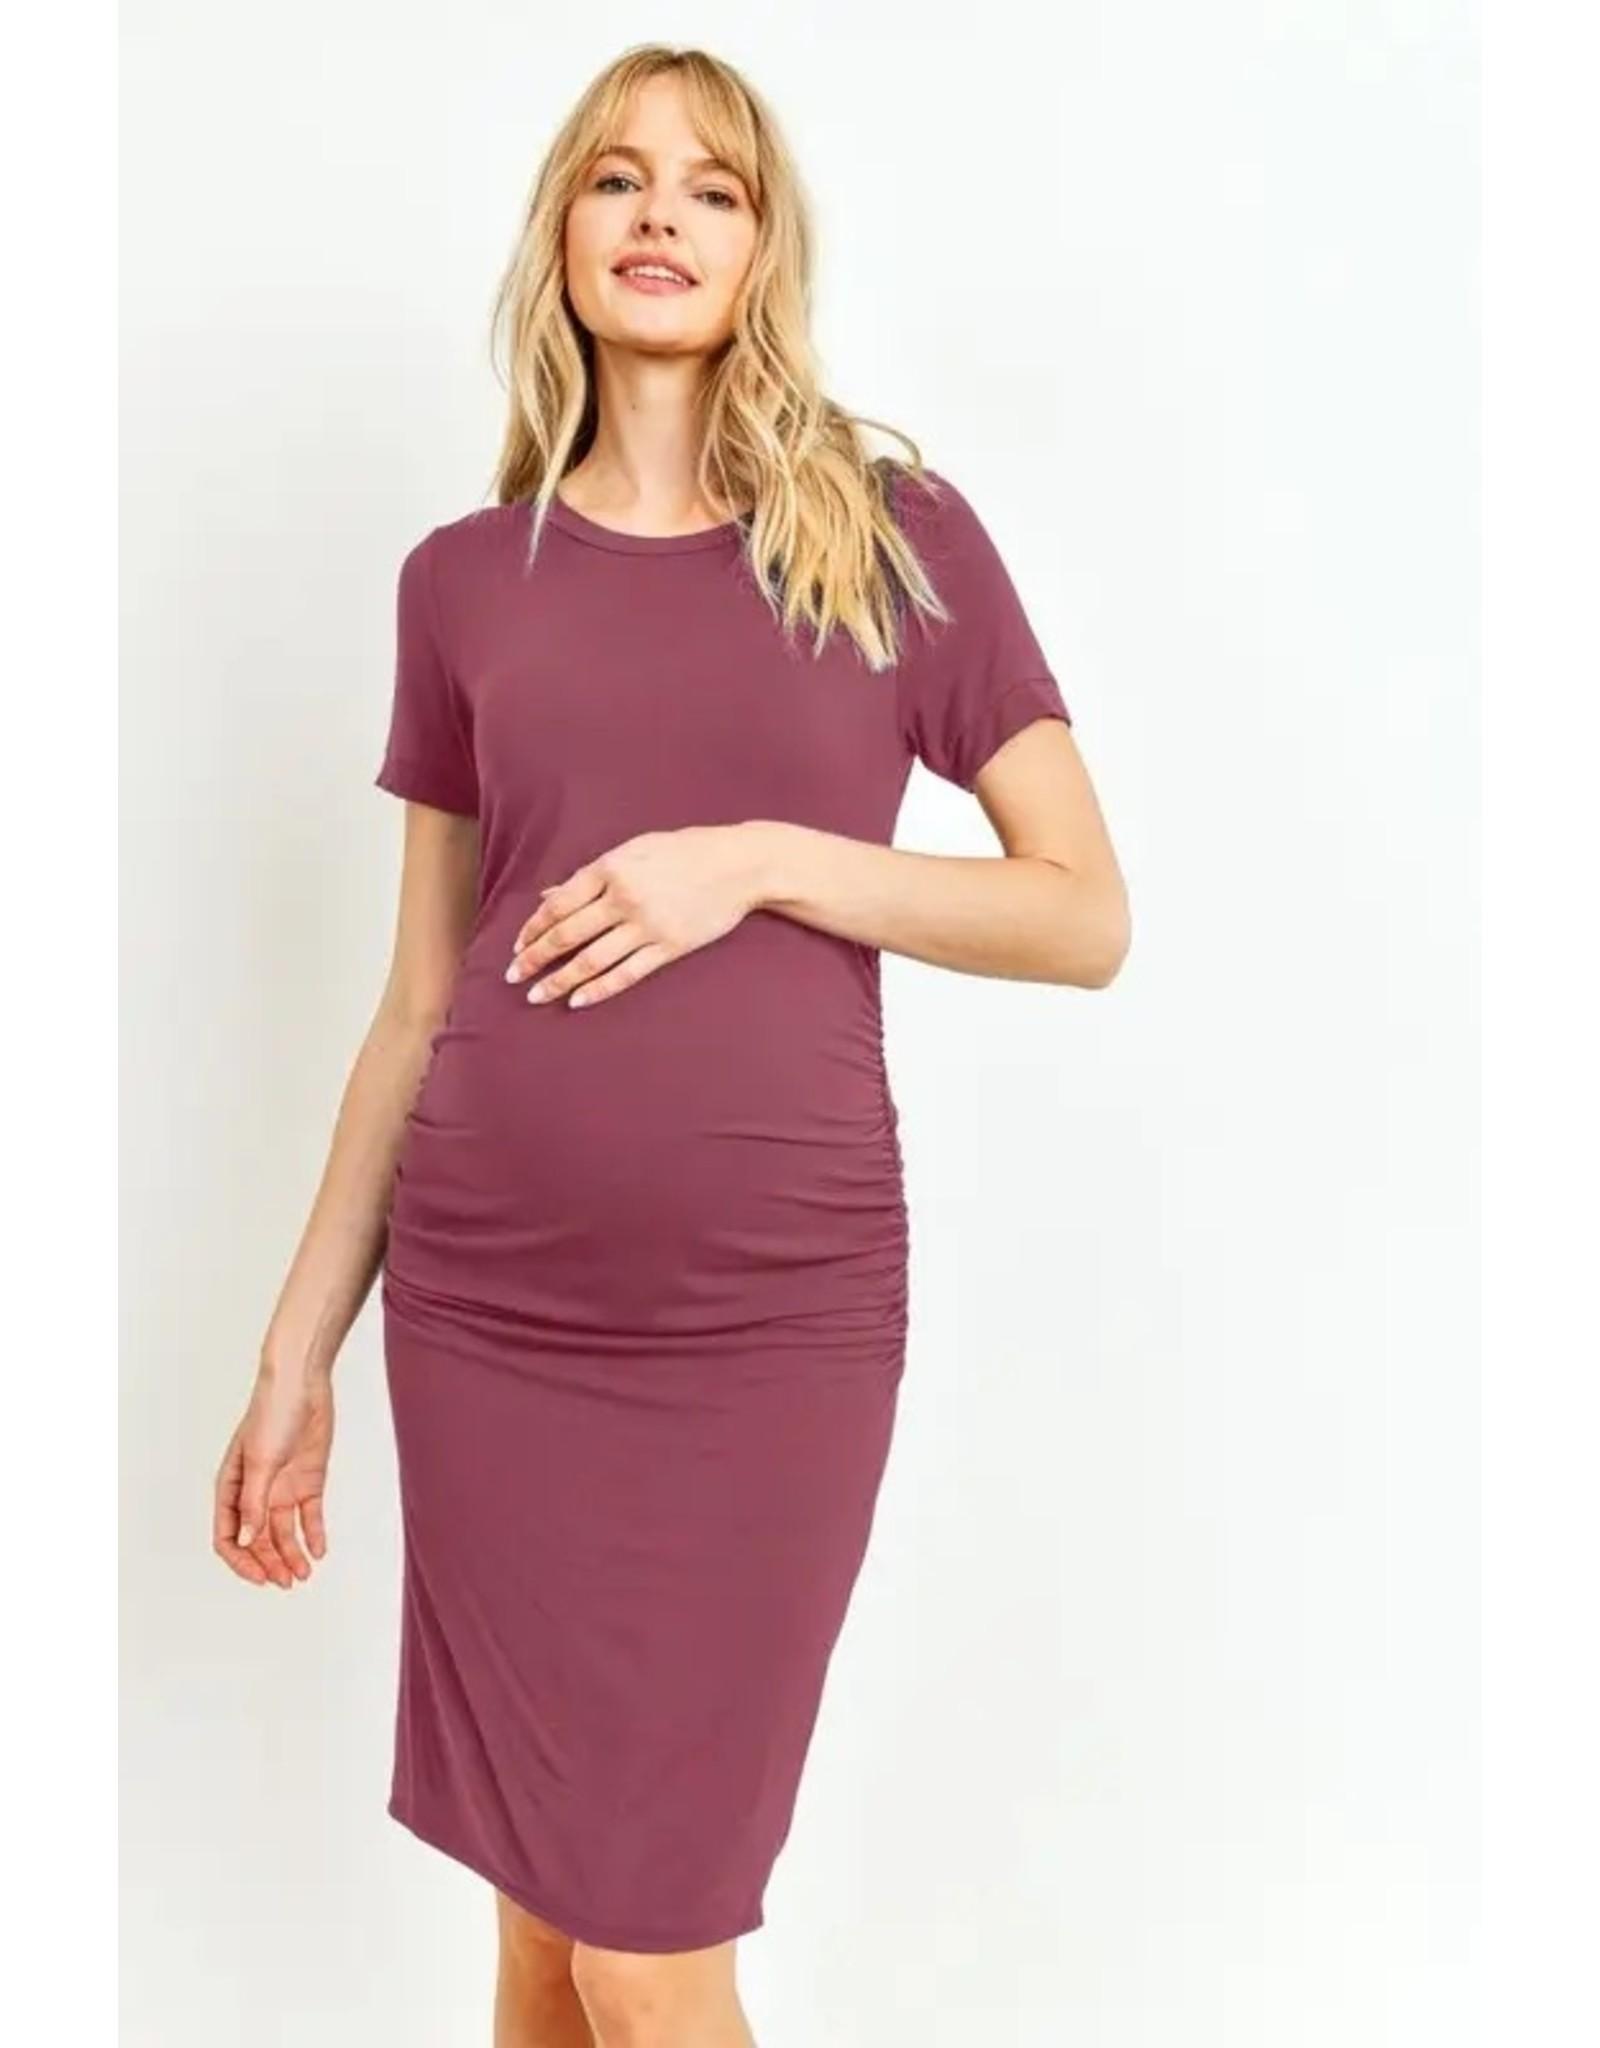 Ashley Nicole, Heavy Modal Basic Maternity Dress, Berry